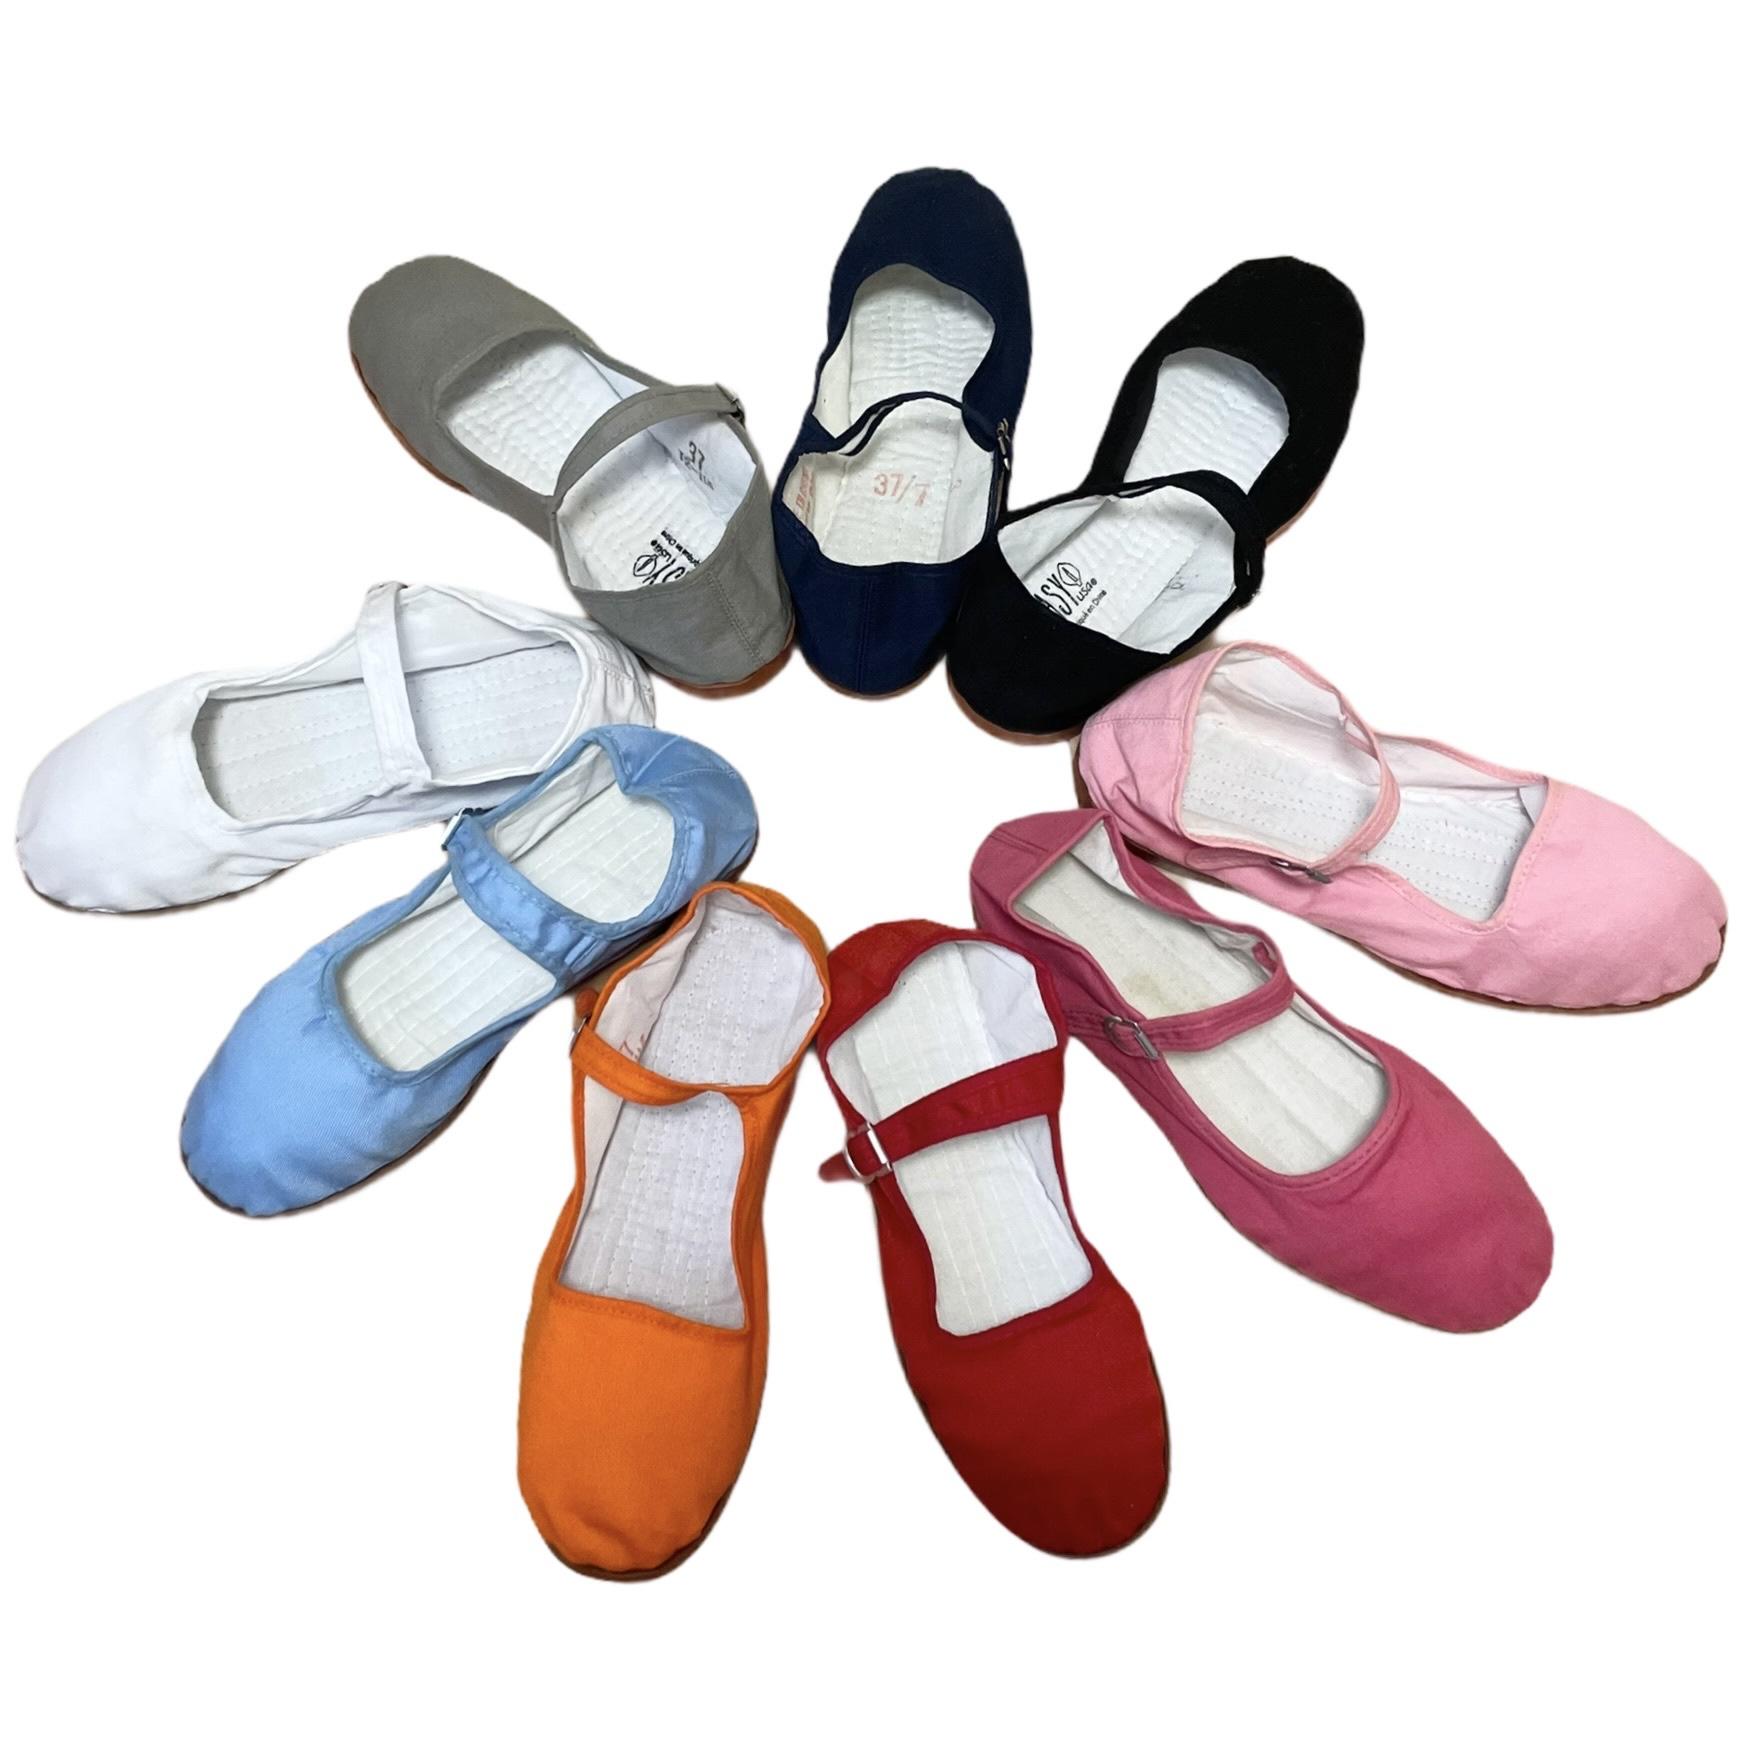 Kung Fu Shoes カンフーシューズ 無地 訳あり品送料無料 ストラップ アウトレット チャイナシューズ